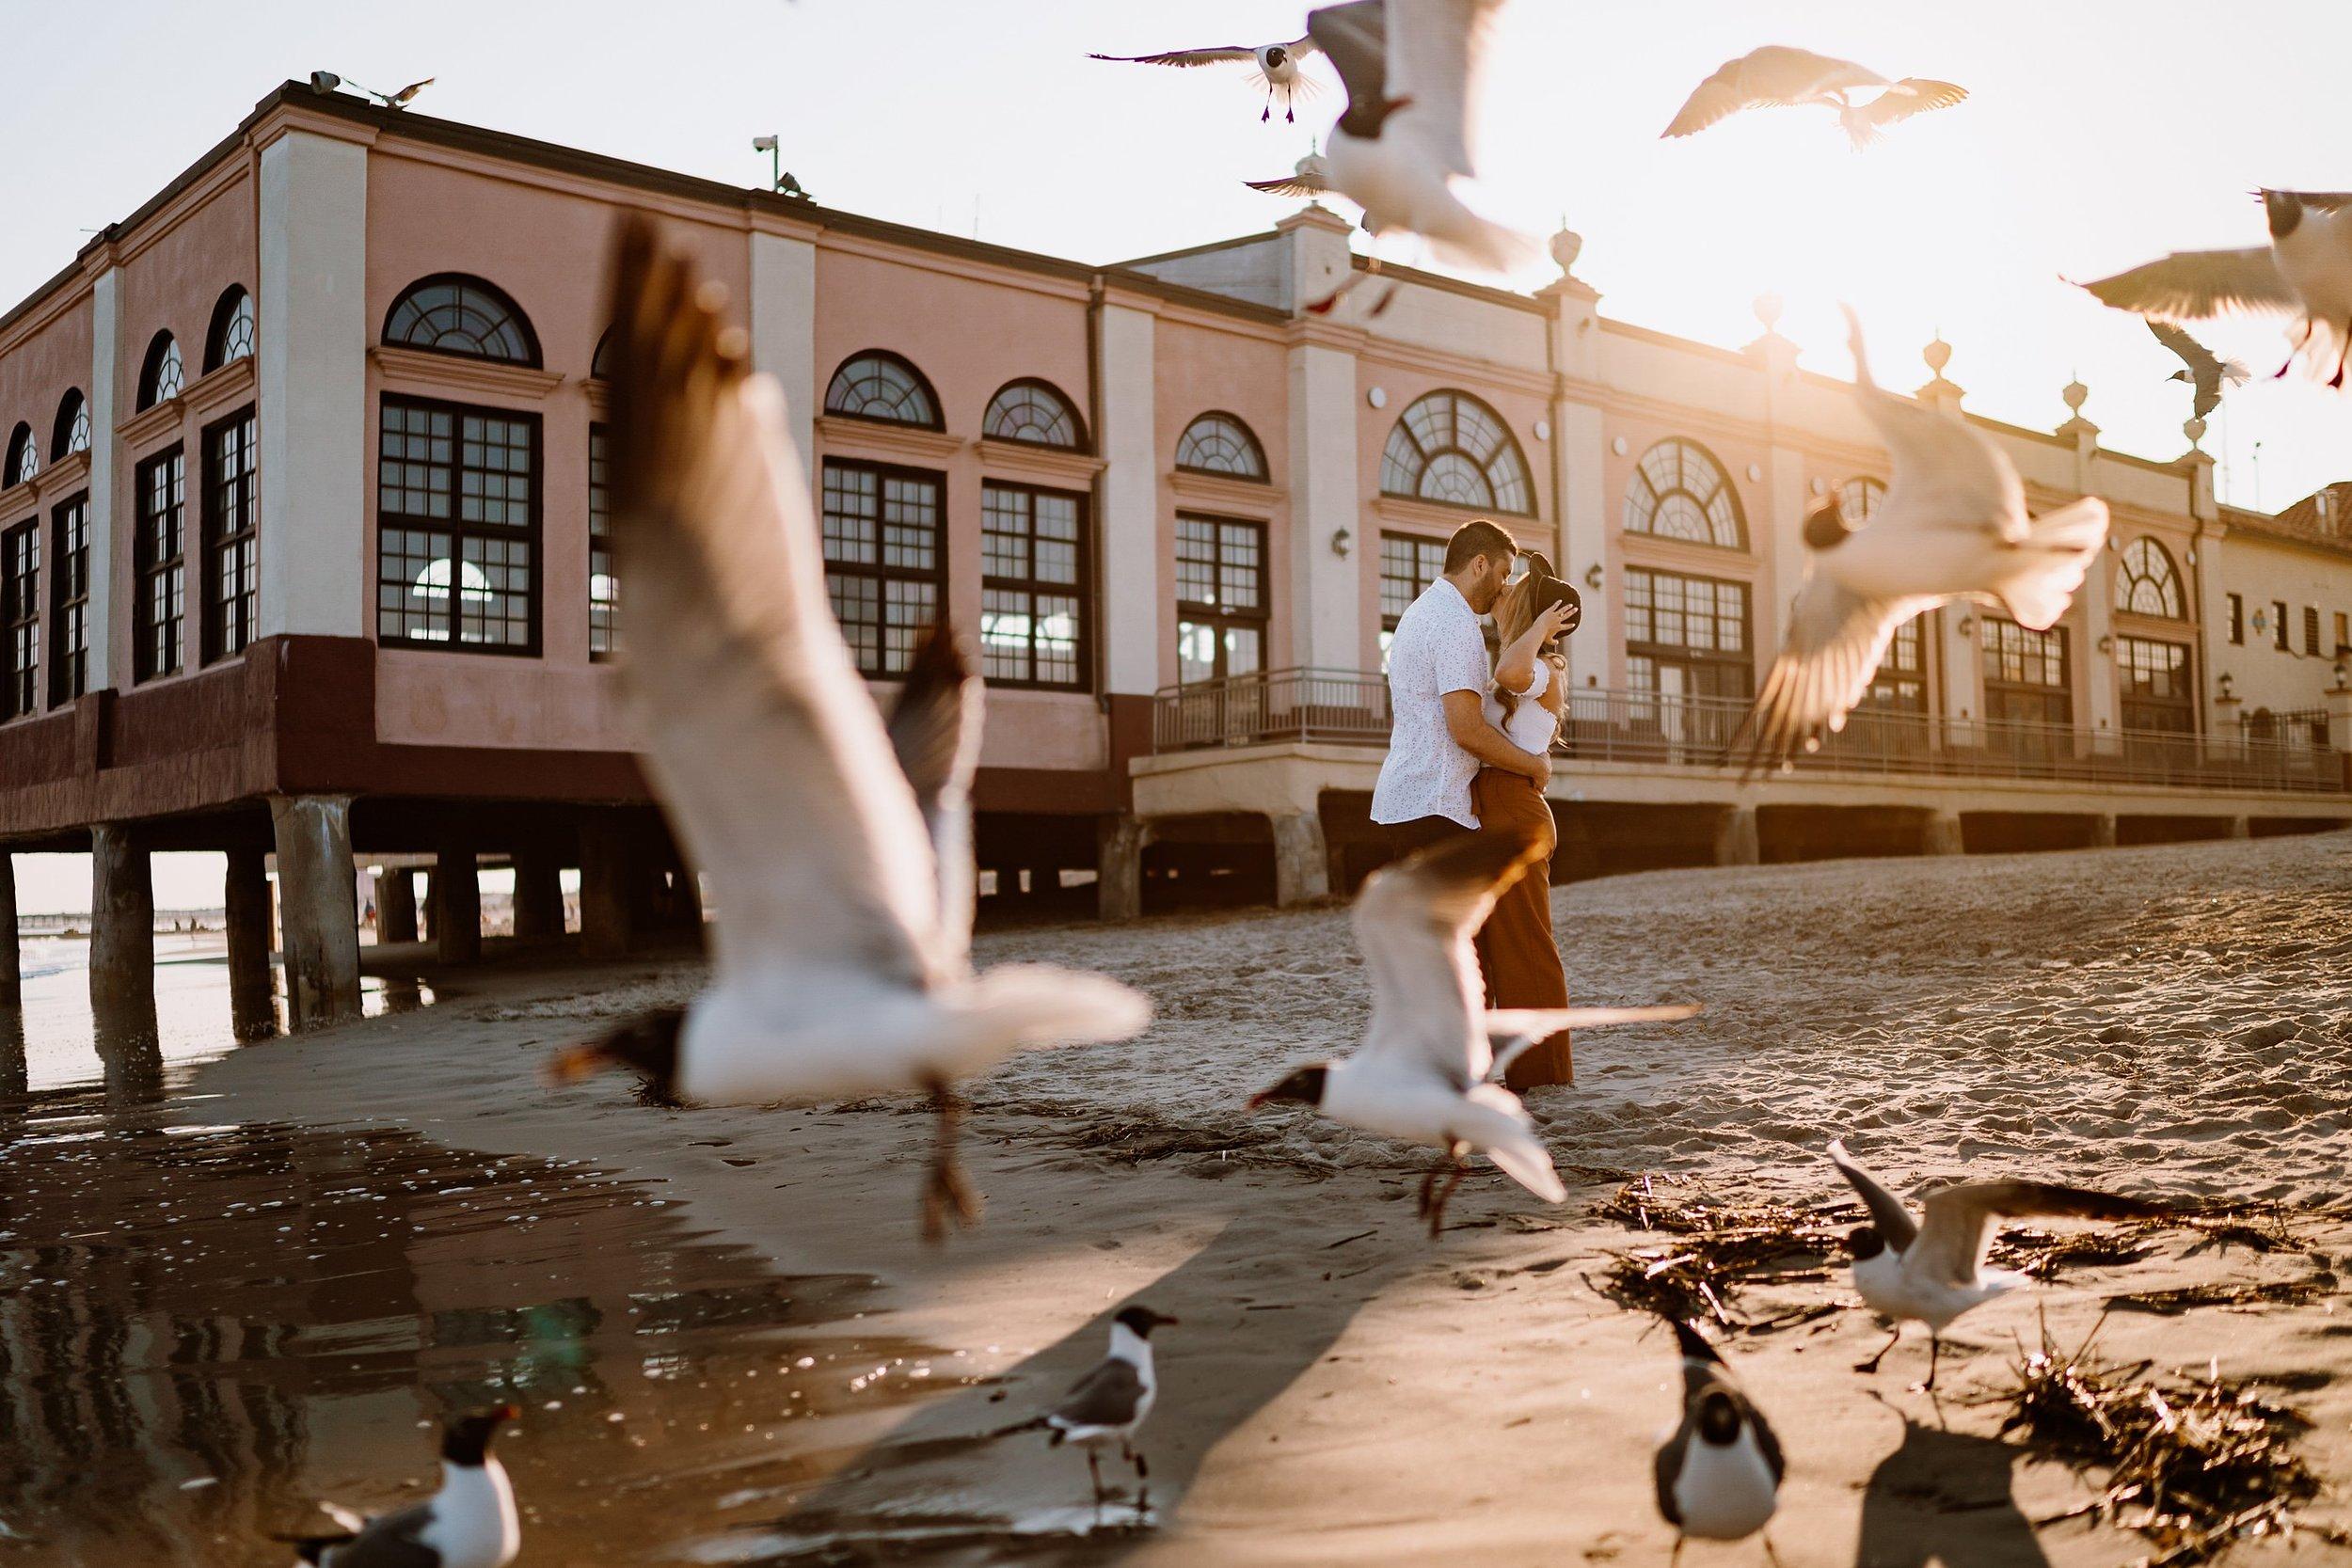 ocean-city-nj-engagement-photos-09.jpg